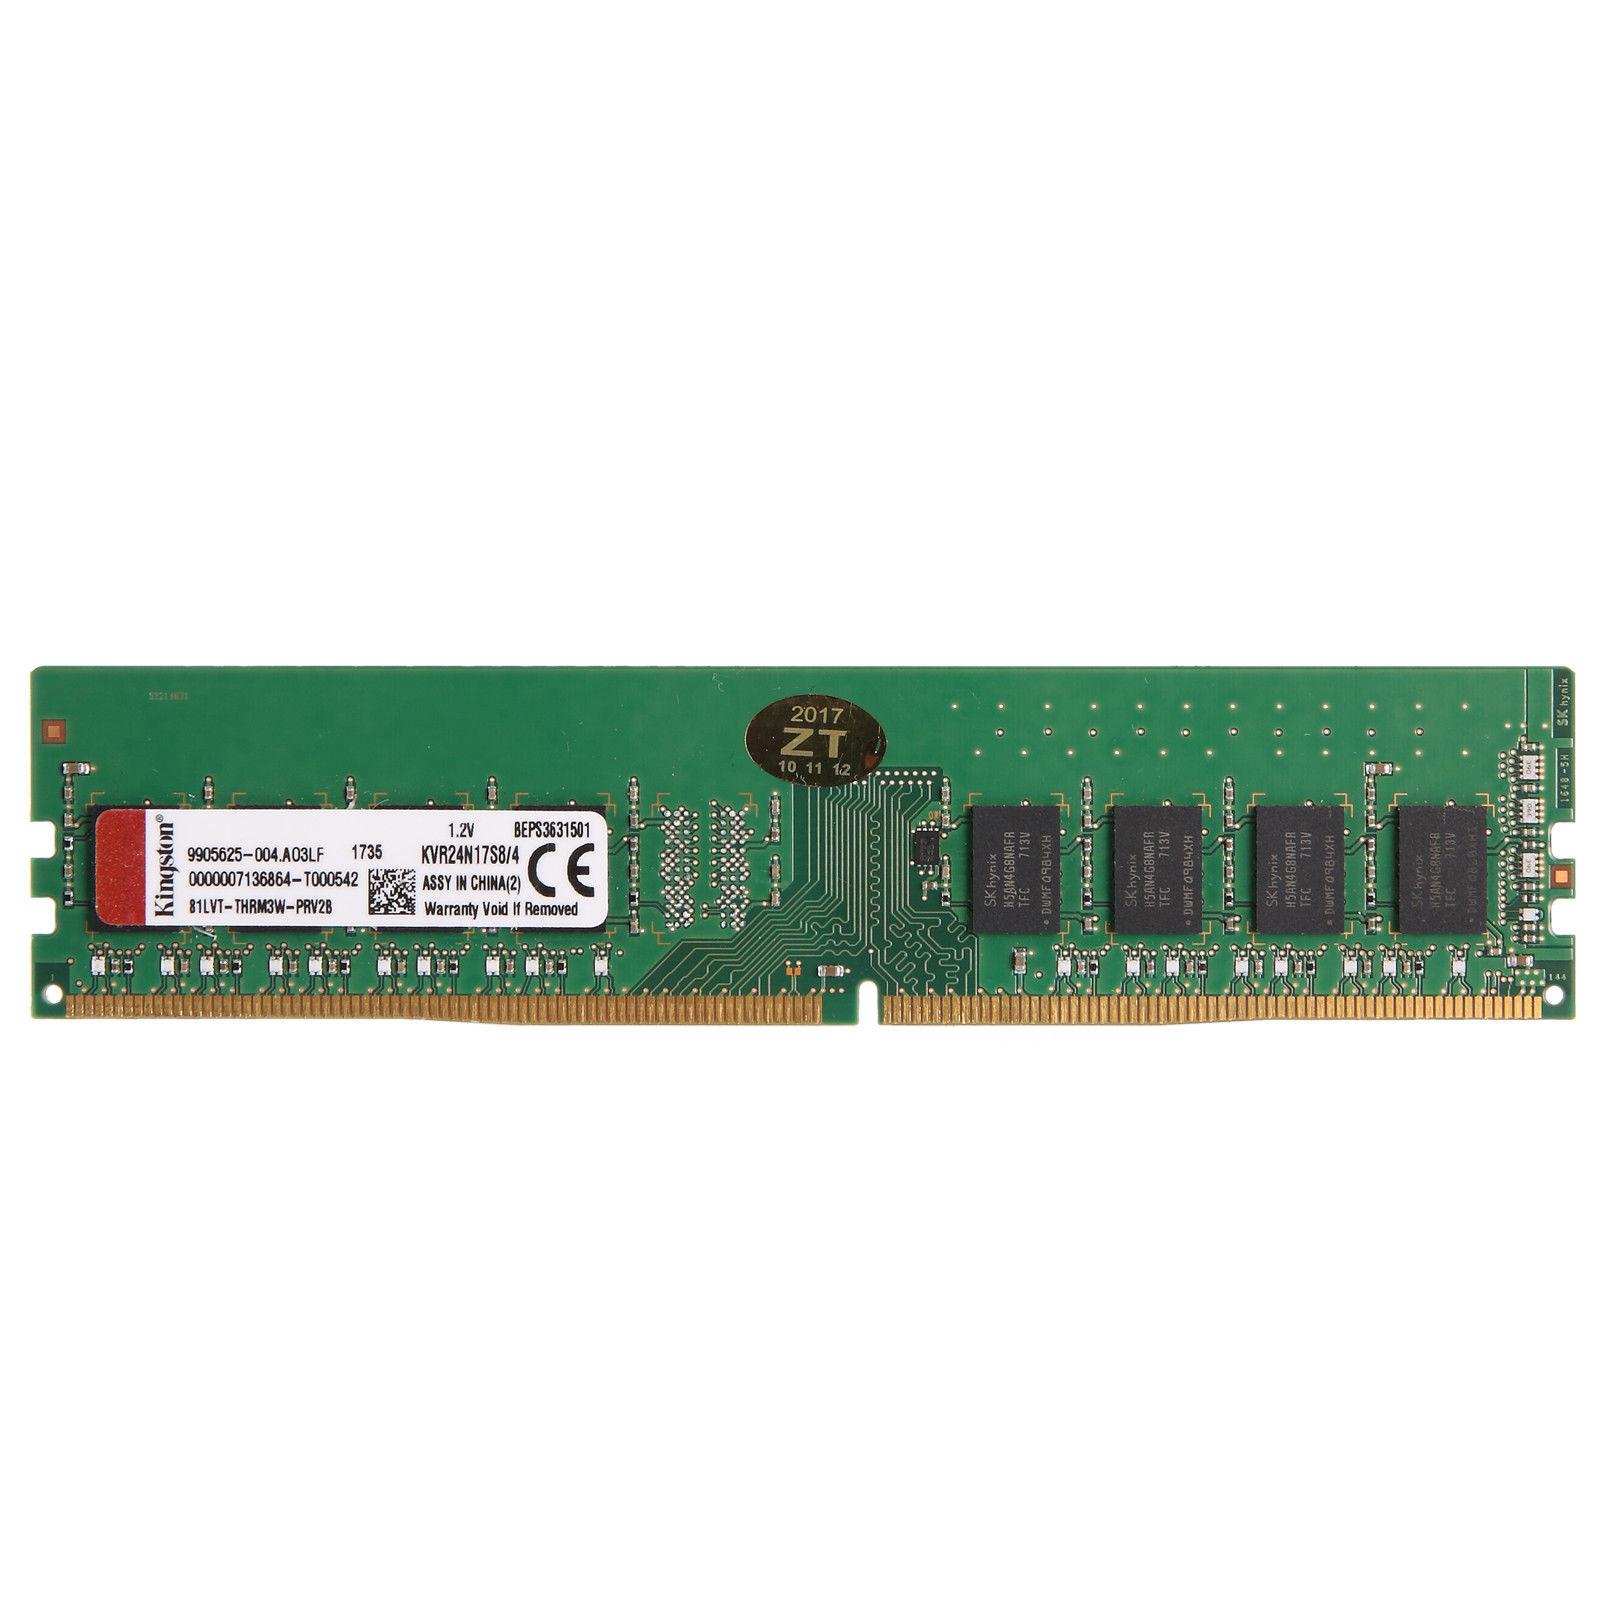 8GB 16GB 32GB DIMM Memory DDR4 PC4-19200 RAM 288PIN 2400MHz SKHynix Desktop